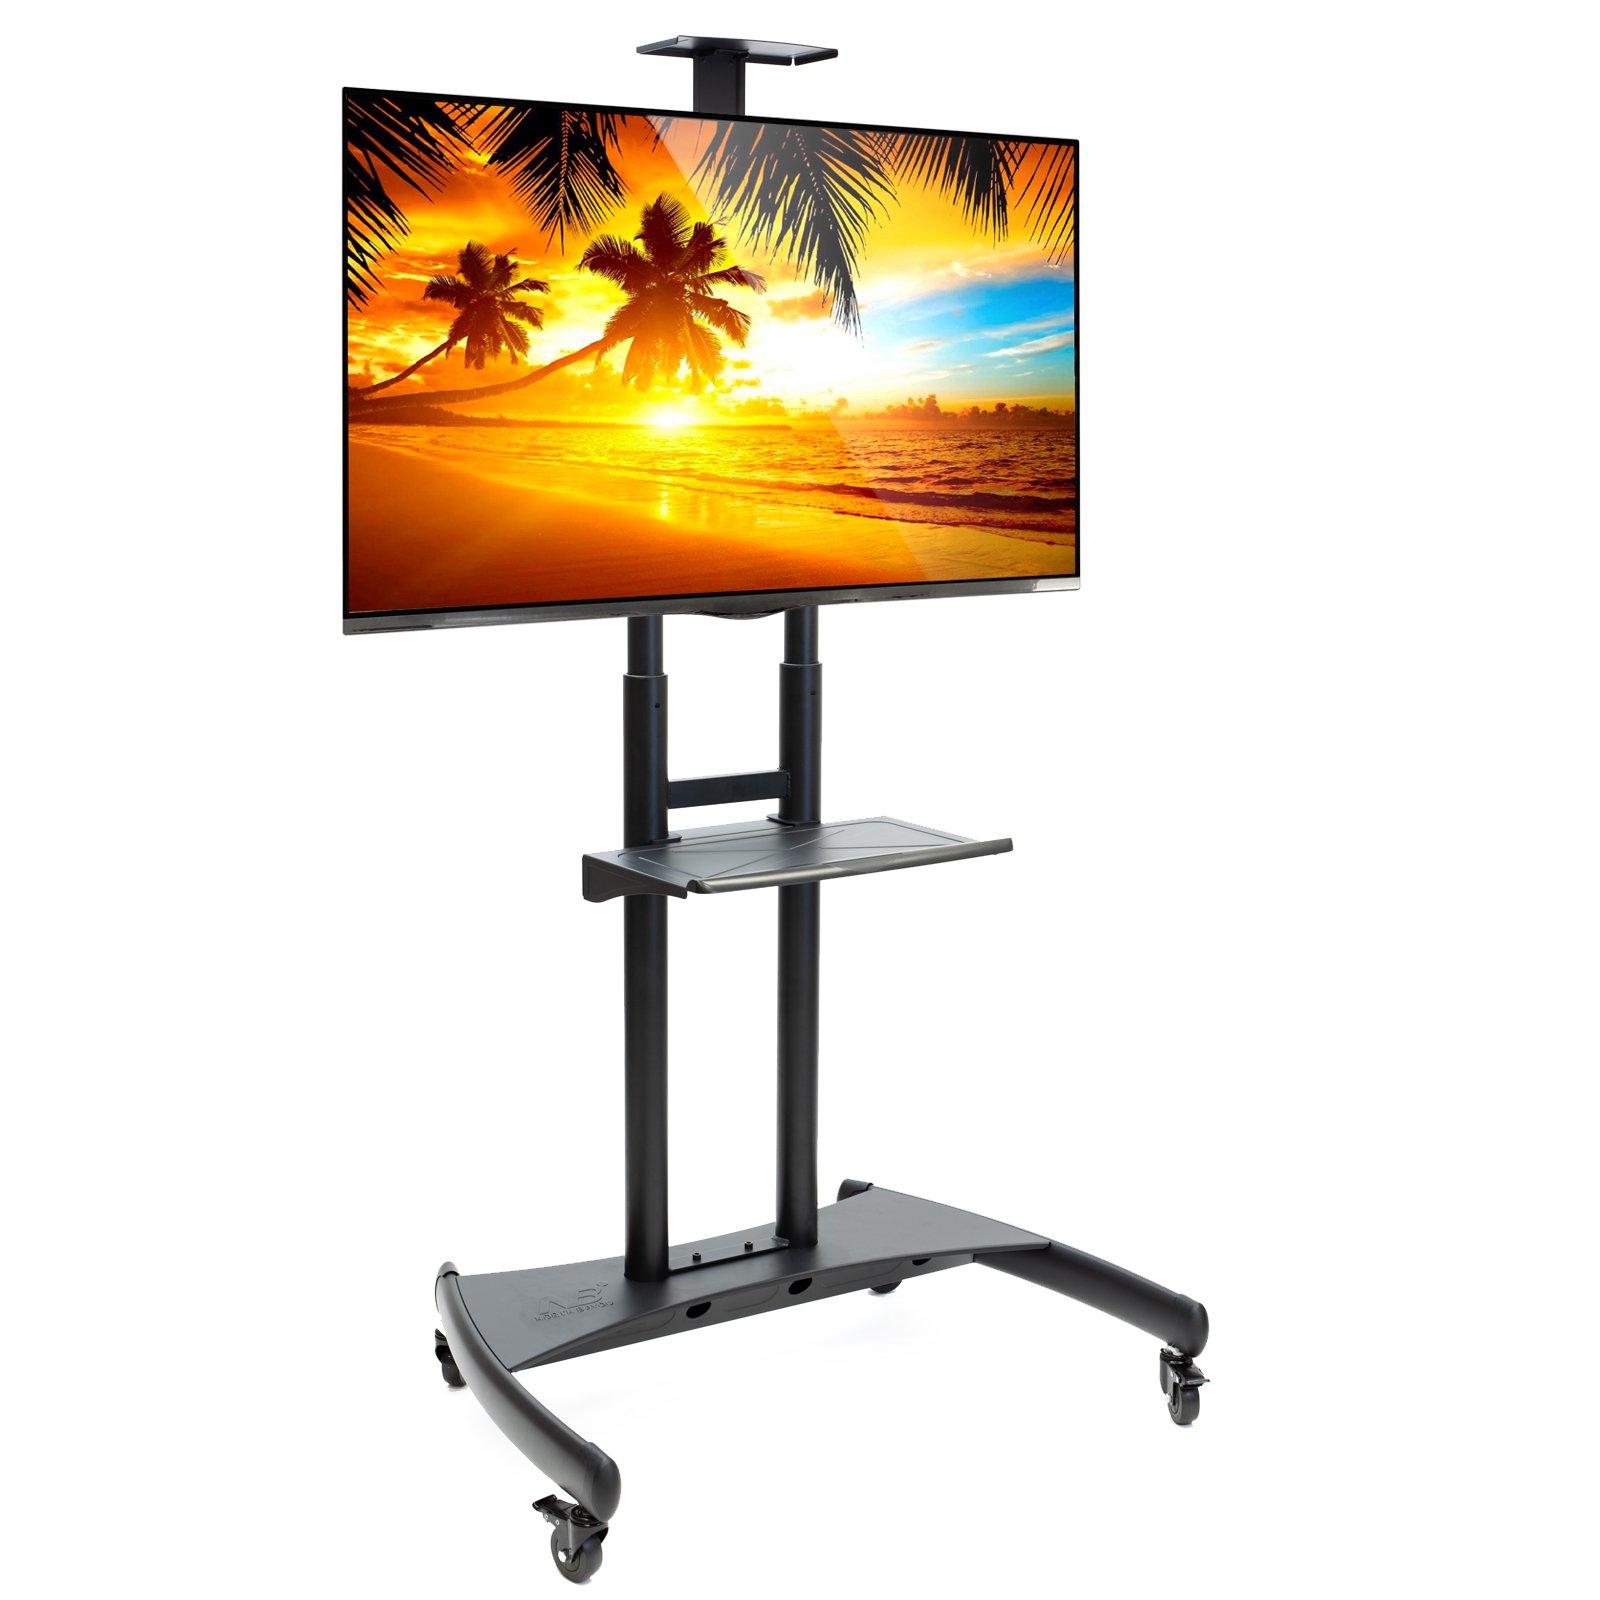 Rolling TV Stand Mobile TV Cart para 55-80 Pulgadas Plasma Pantalla, LED, LCD, OLED, Curved TVs – Soporte Universal con Ruedas: Amazon.es: Hogar